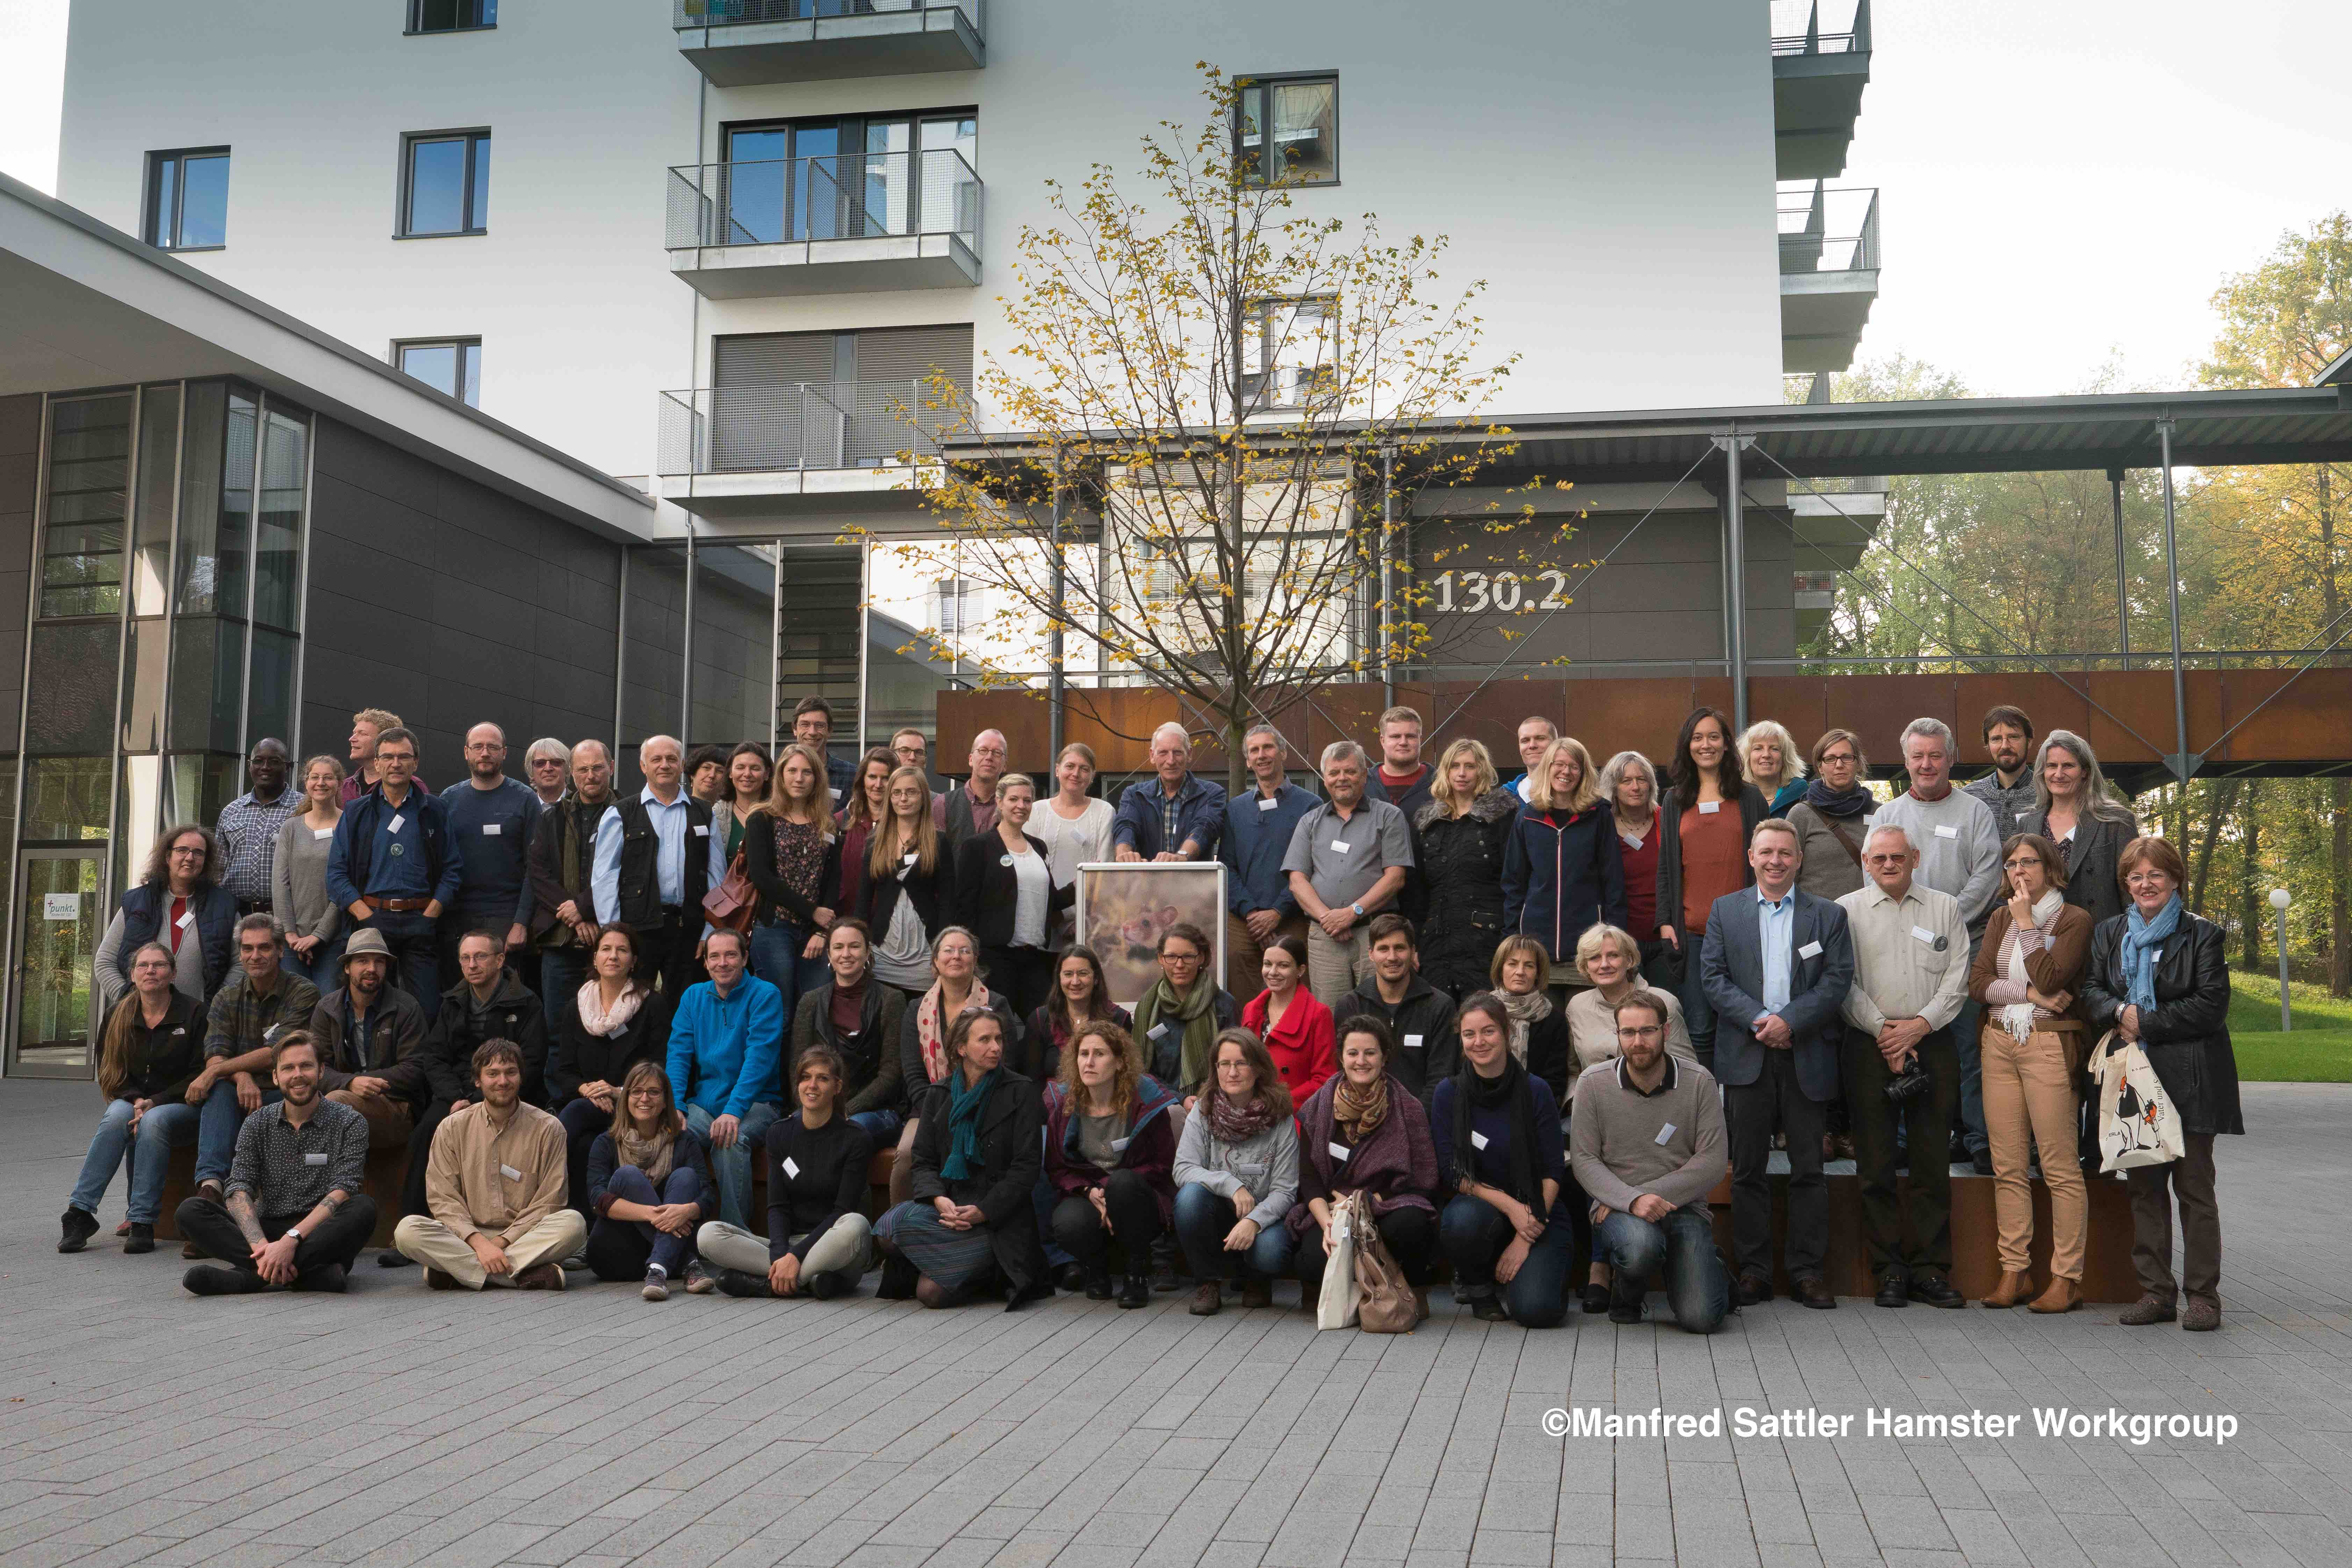 hamster workgroup_Manfred Sattler (5)